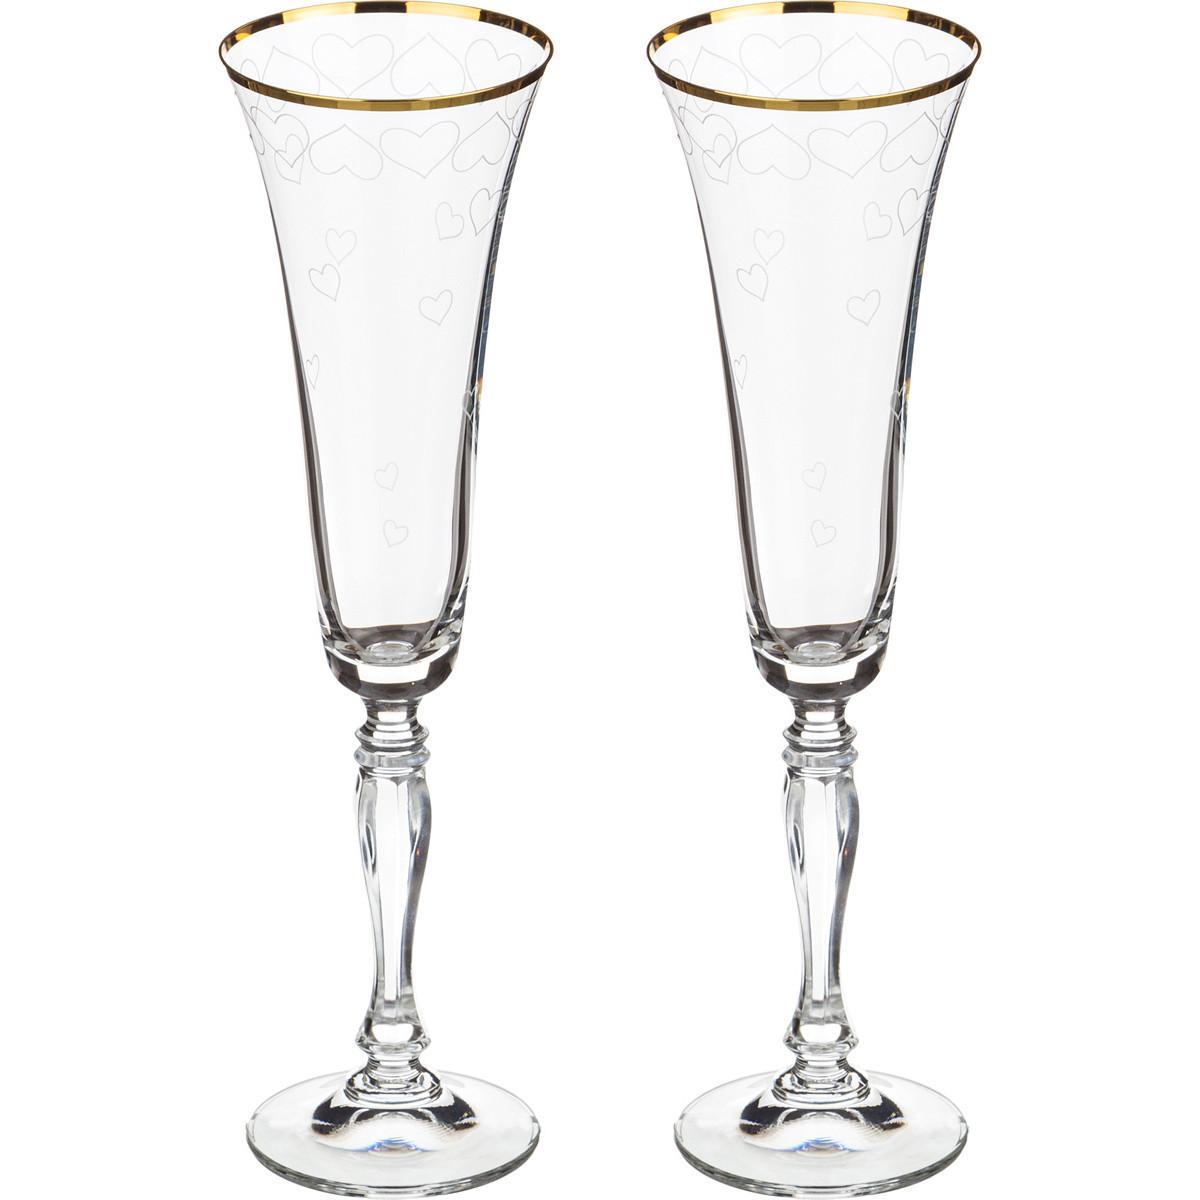 {} Bohemia Crystal Набор бокалов для шампанского Milly (25 см - 2 шт) bohemia crystal набор бокалов для шампанского felina 25 см 2 шт